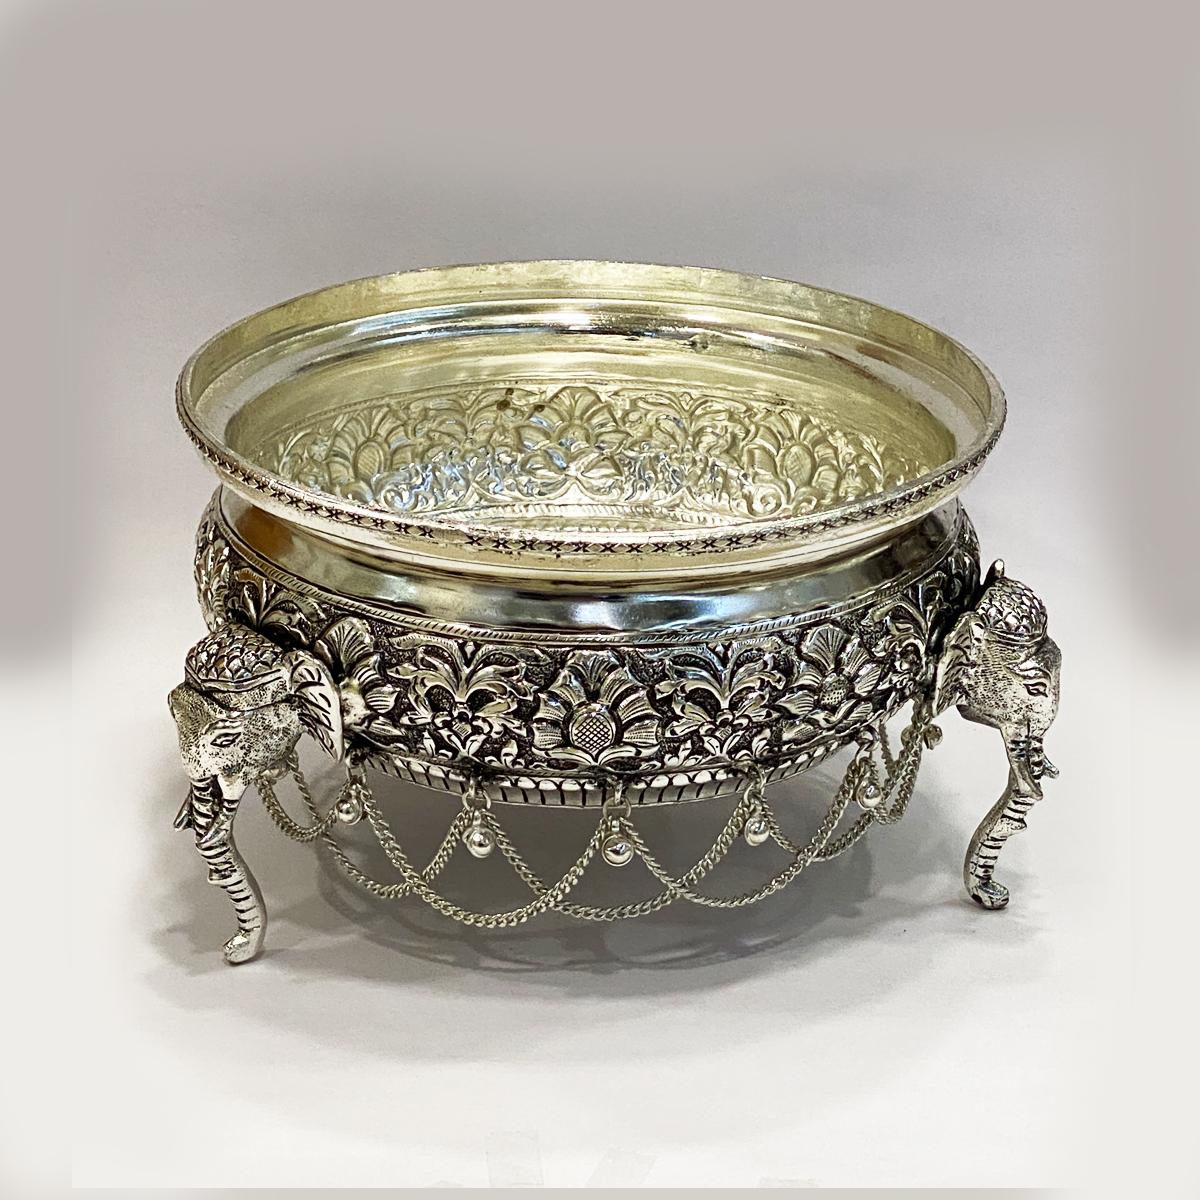 a Super Silver Antique Bowl or Urli   8 Inch